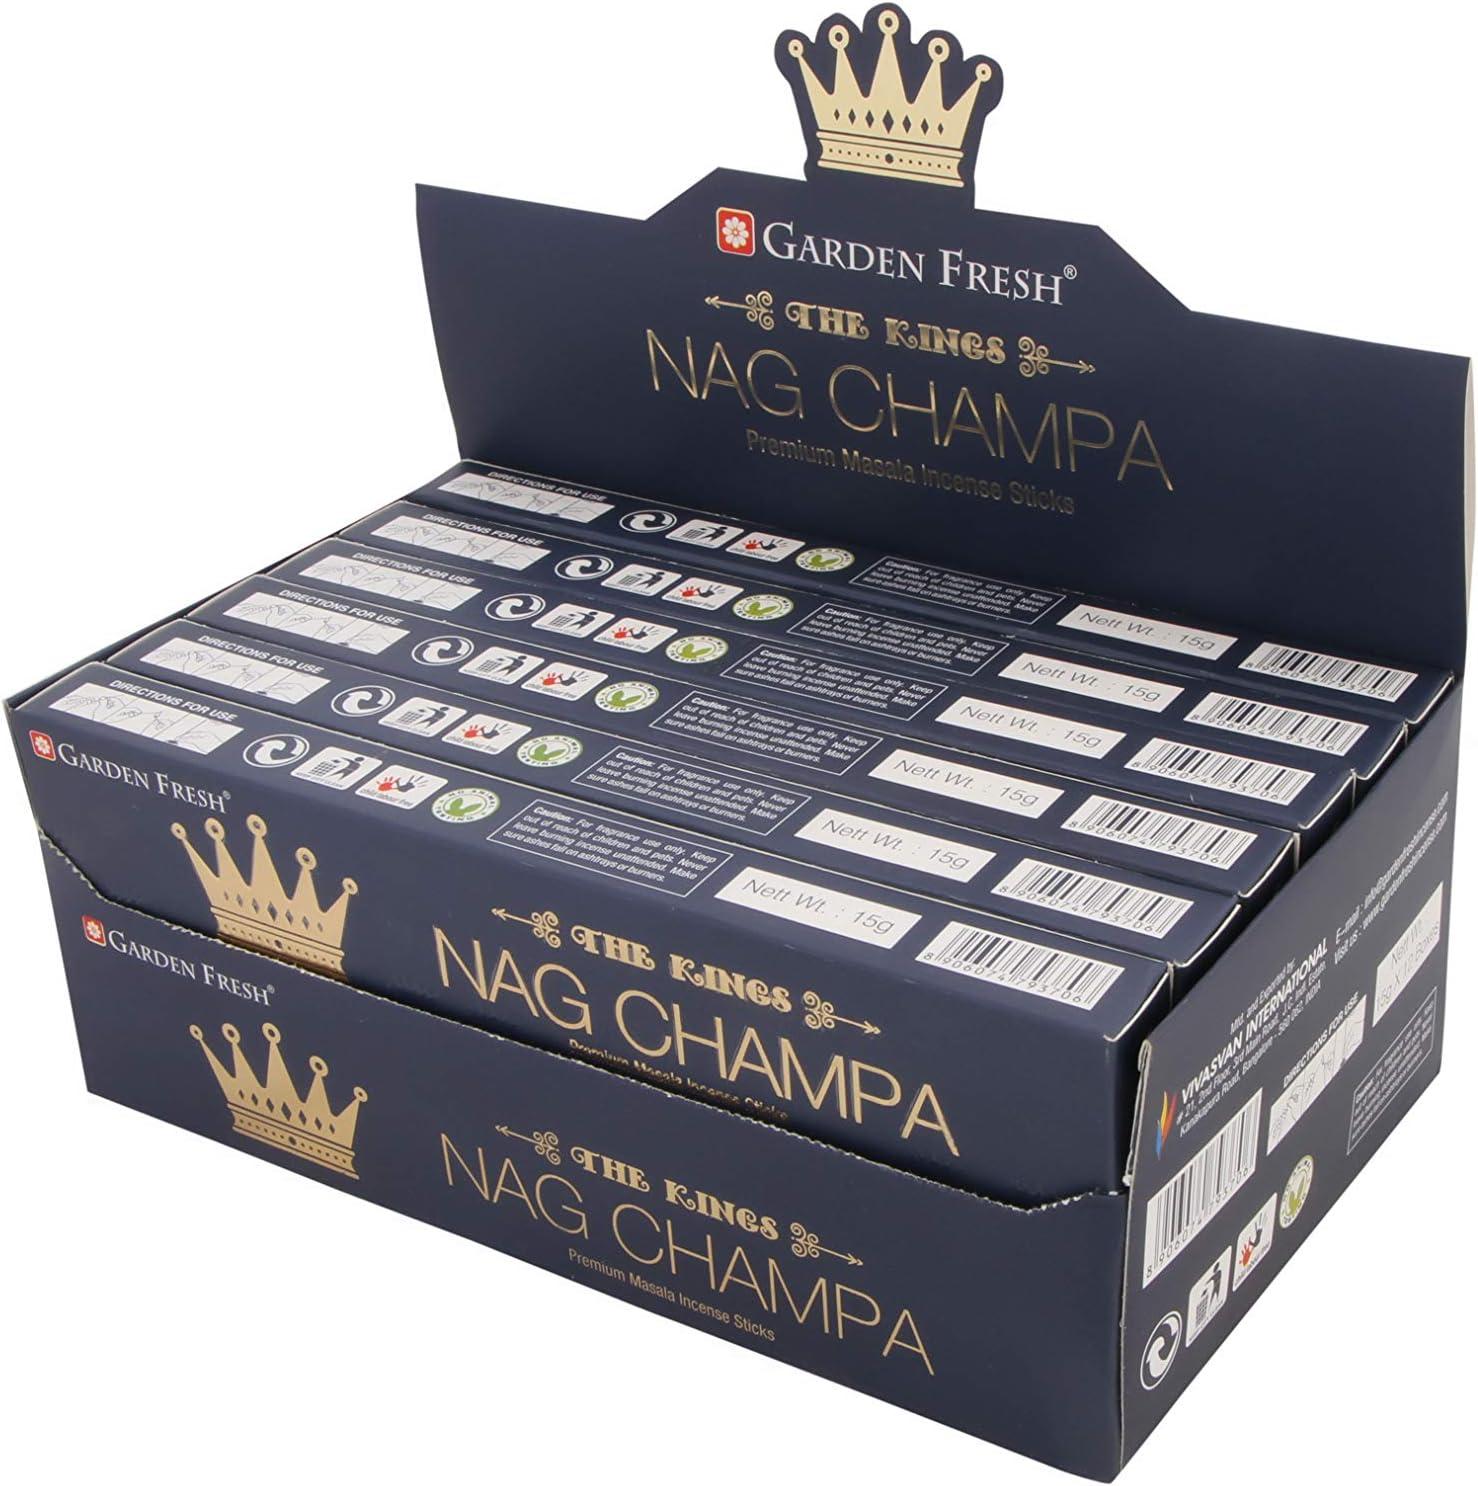 Incienso Premium Nag Champa | 12 Paquetes de 15 Gramos Cada uno en una Caja | Caja de 180 Gramos | Incienso Puro y Natural